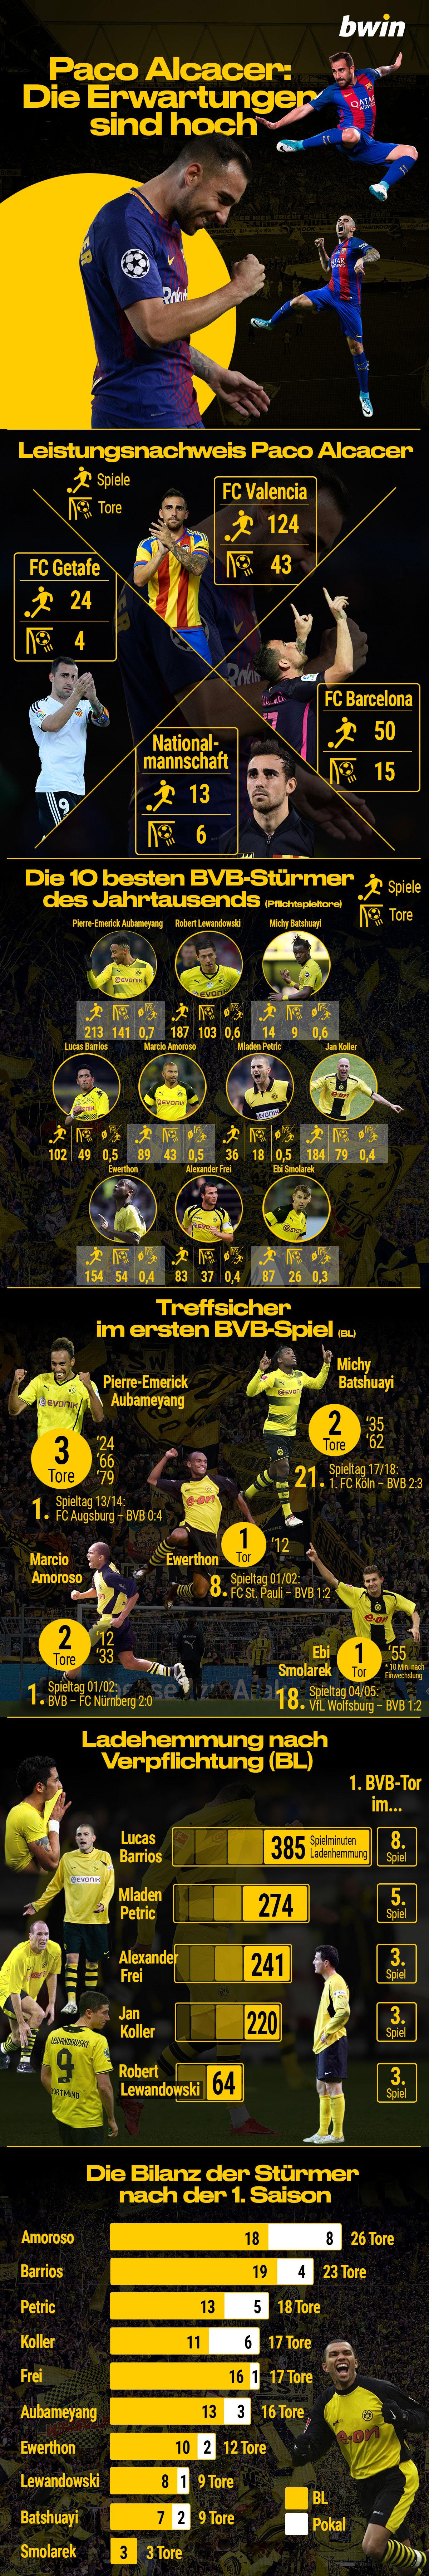 Die besten BVB Stürmer, Hohe Erwartungen an Paco Alcacer